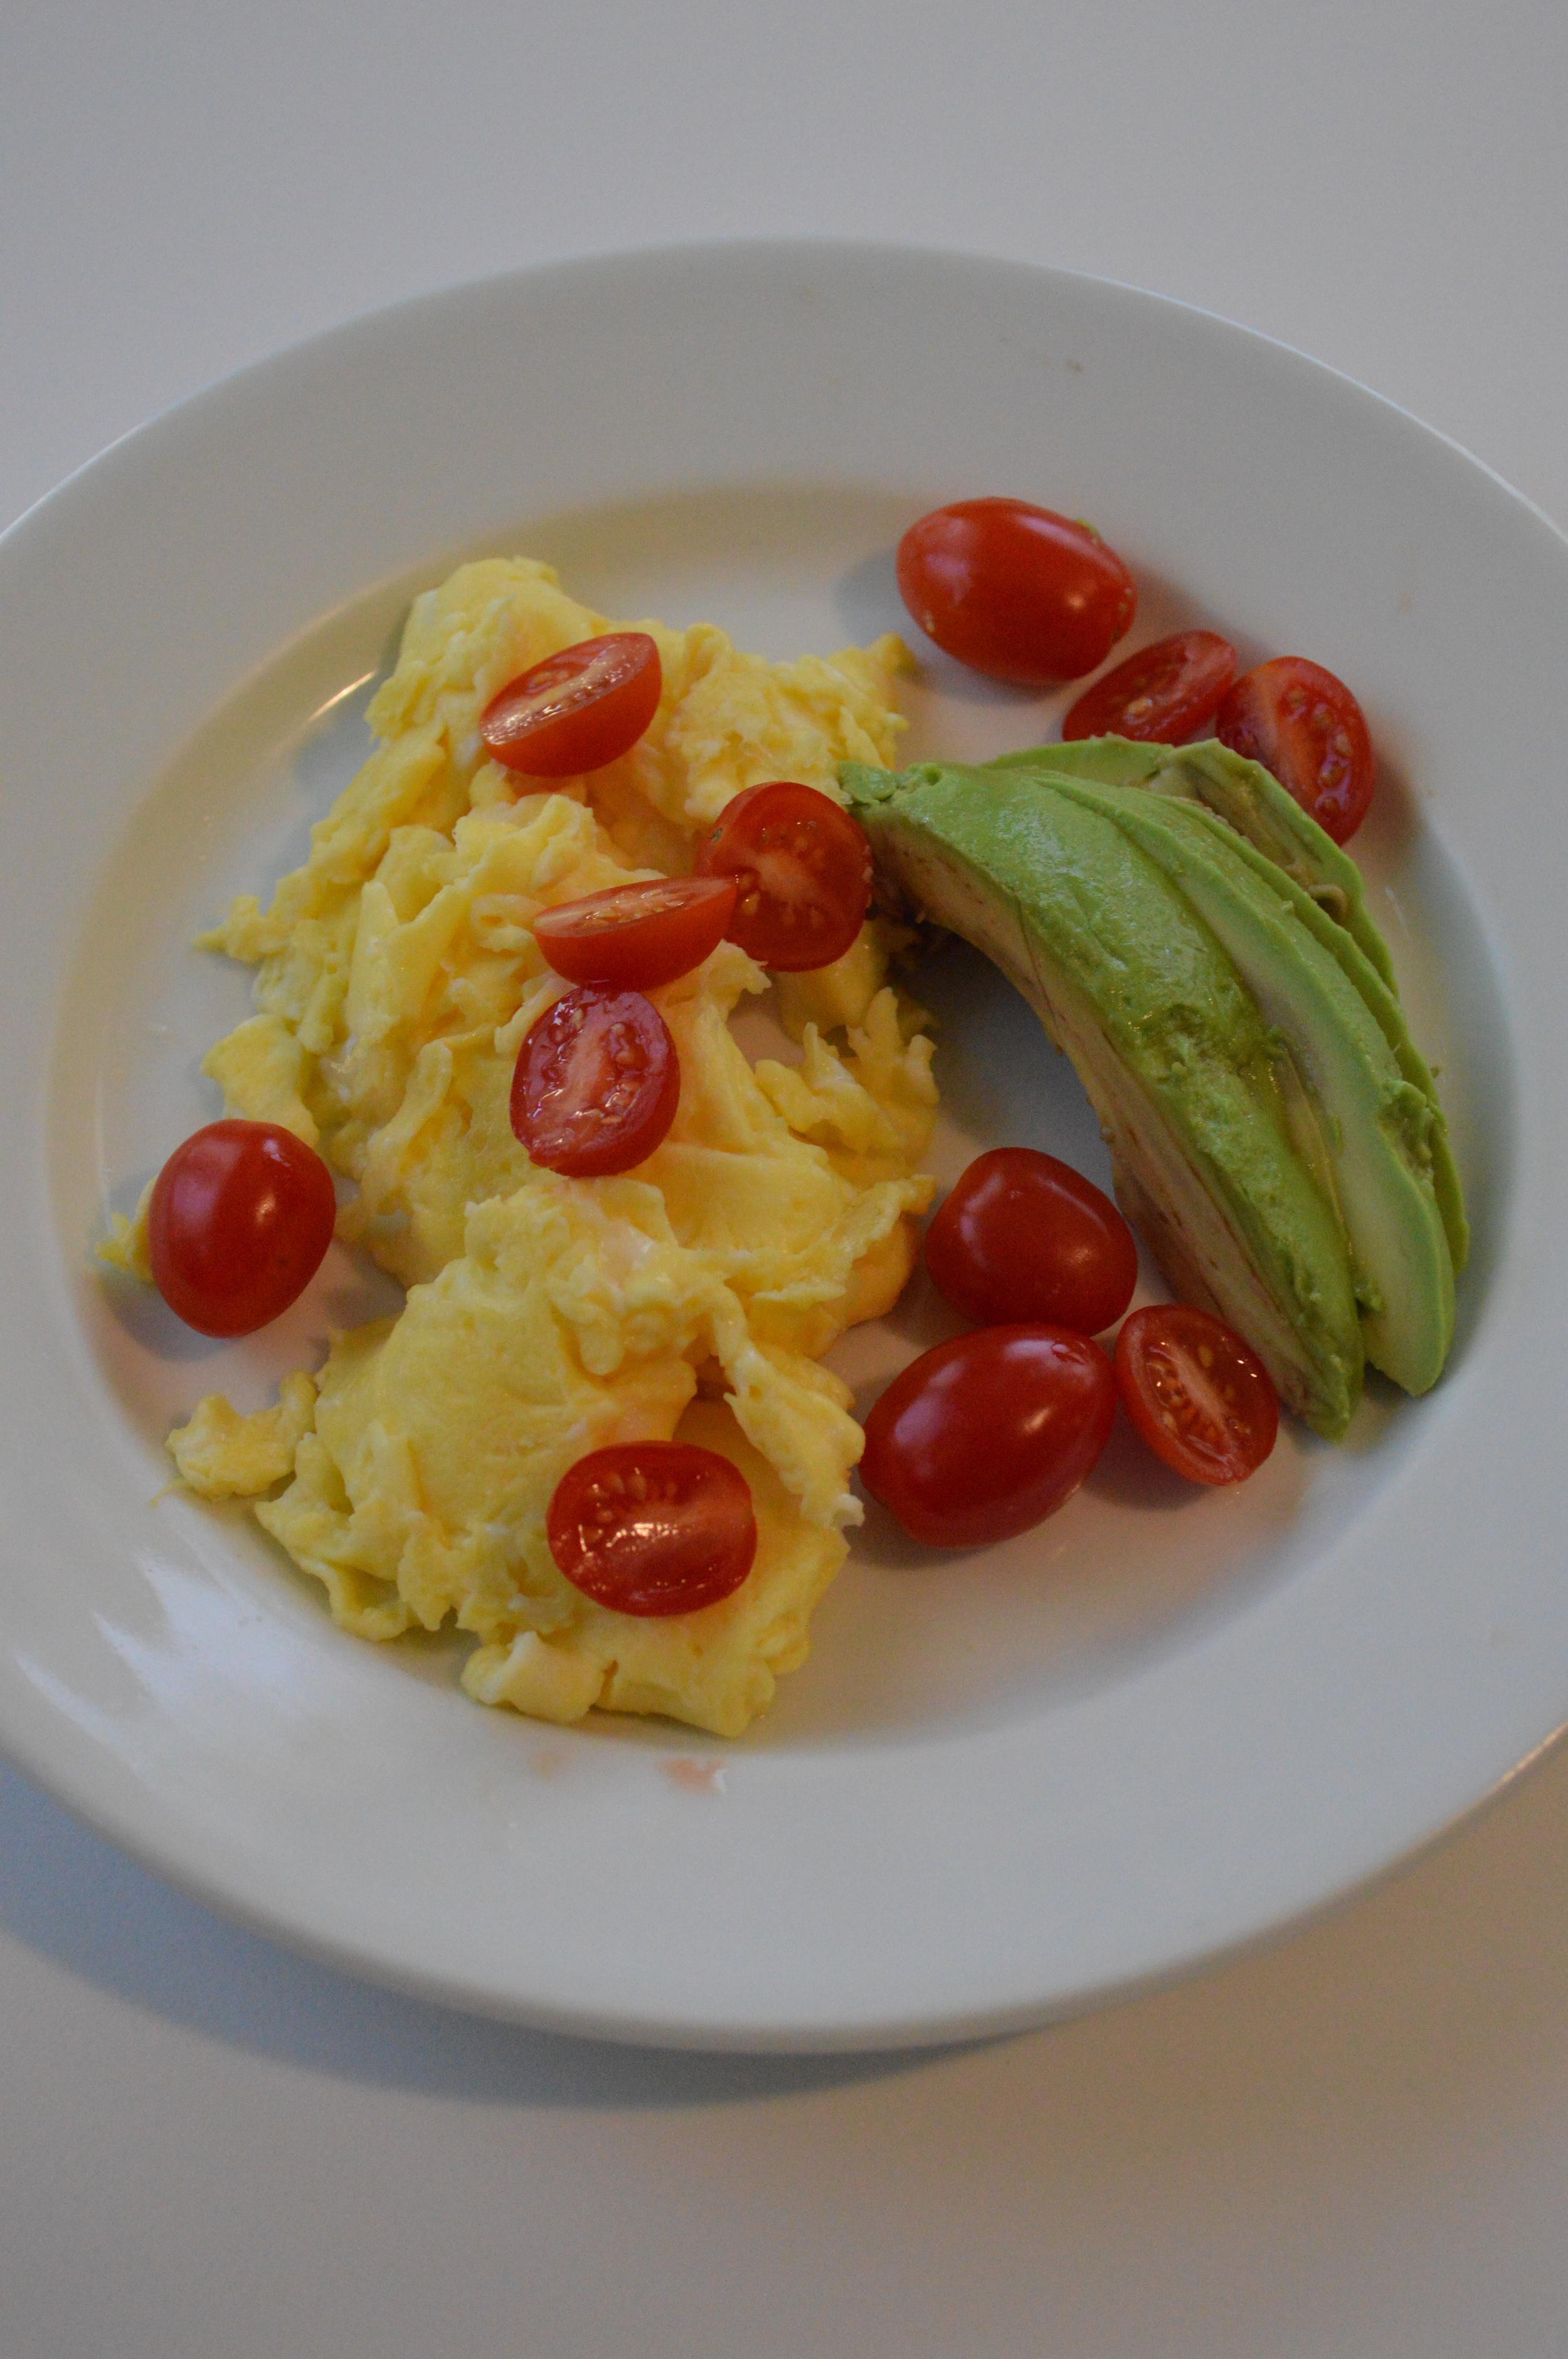 Eggs, Tomato, Avocado